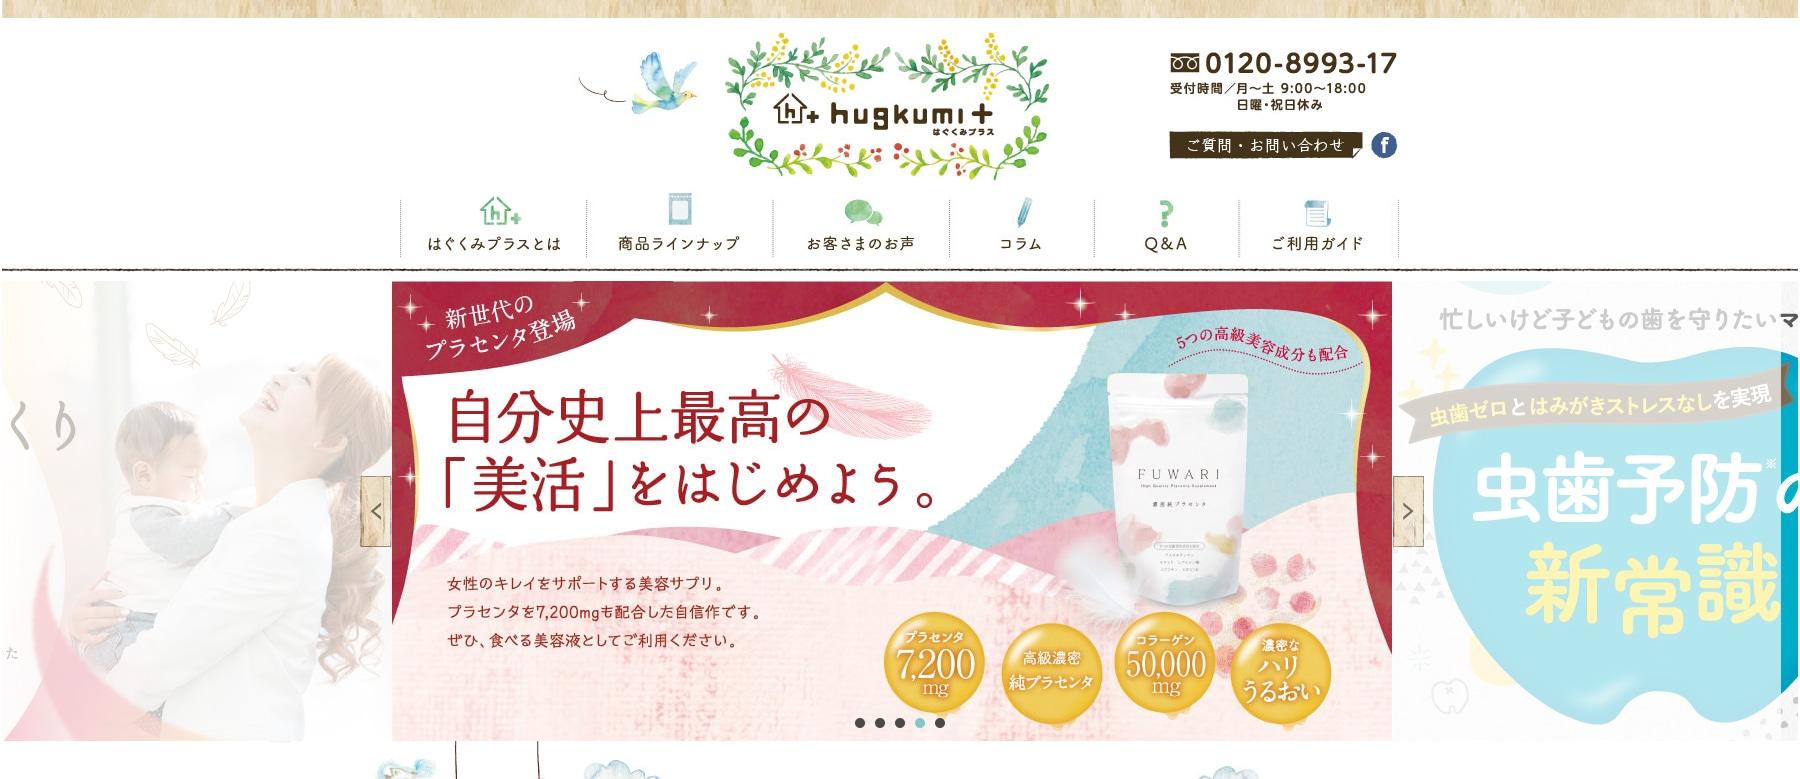 ECサイトの画像